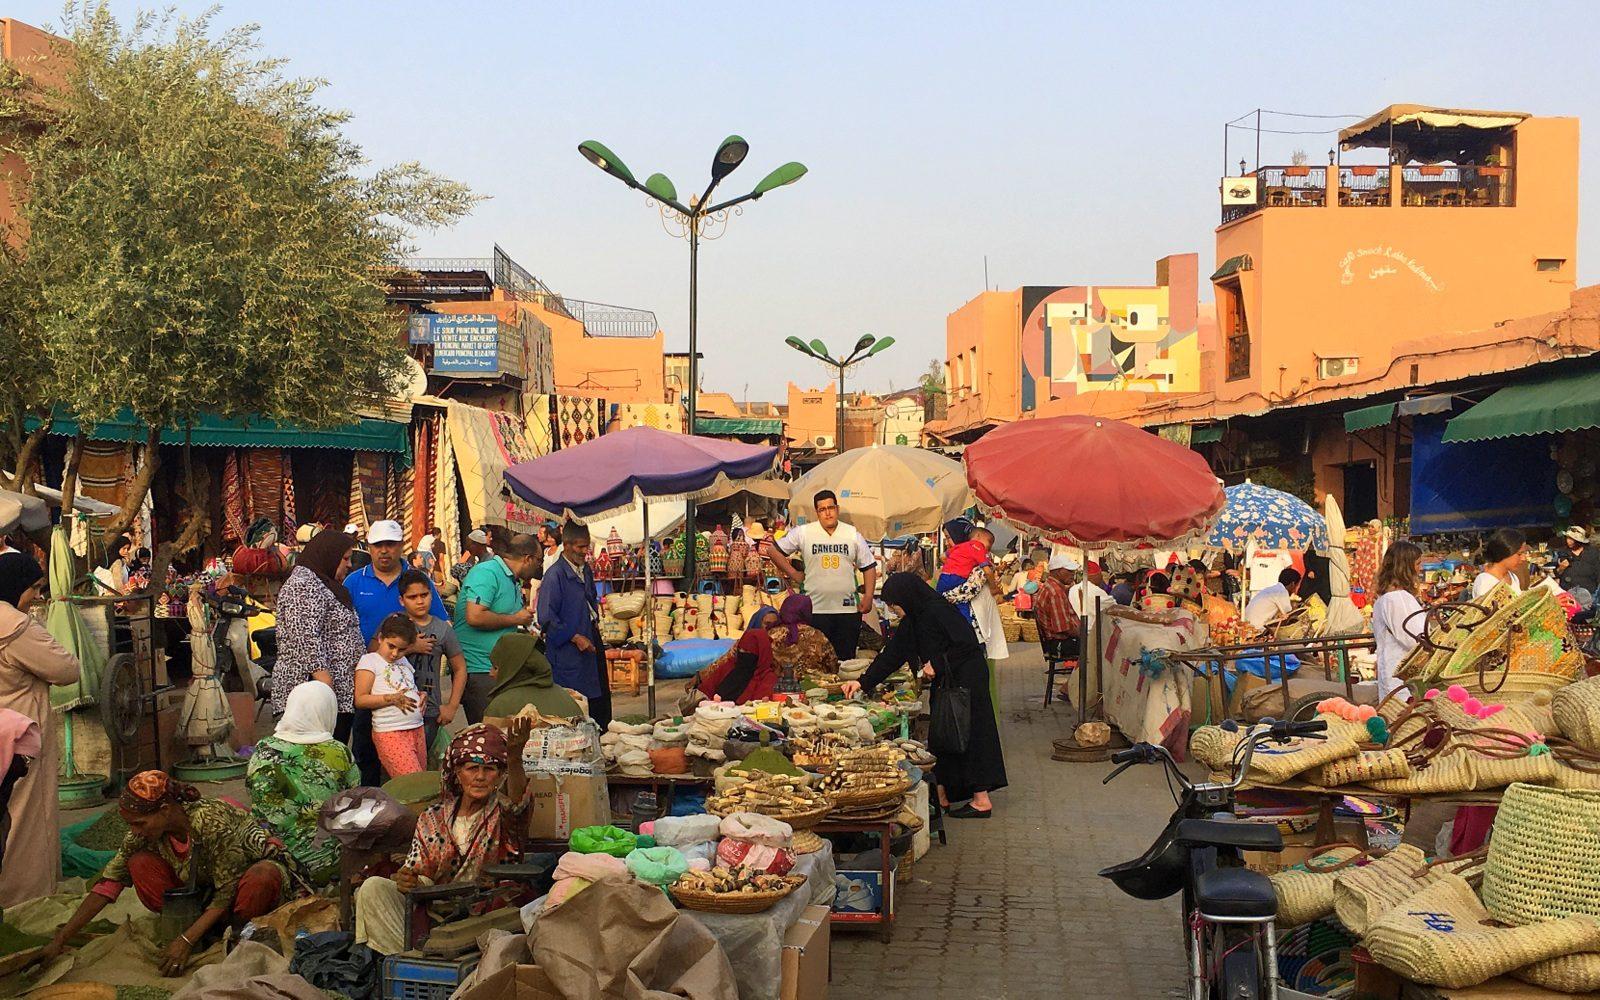 Marrakeshin medina spices